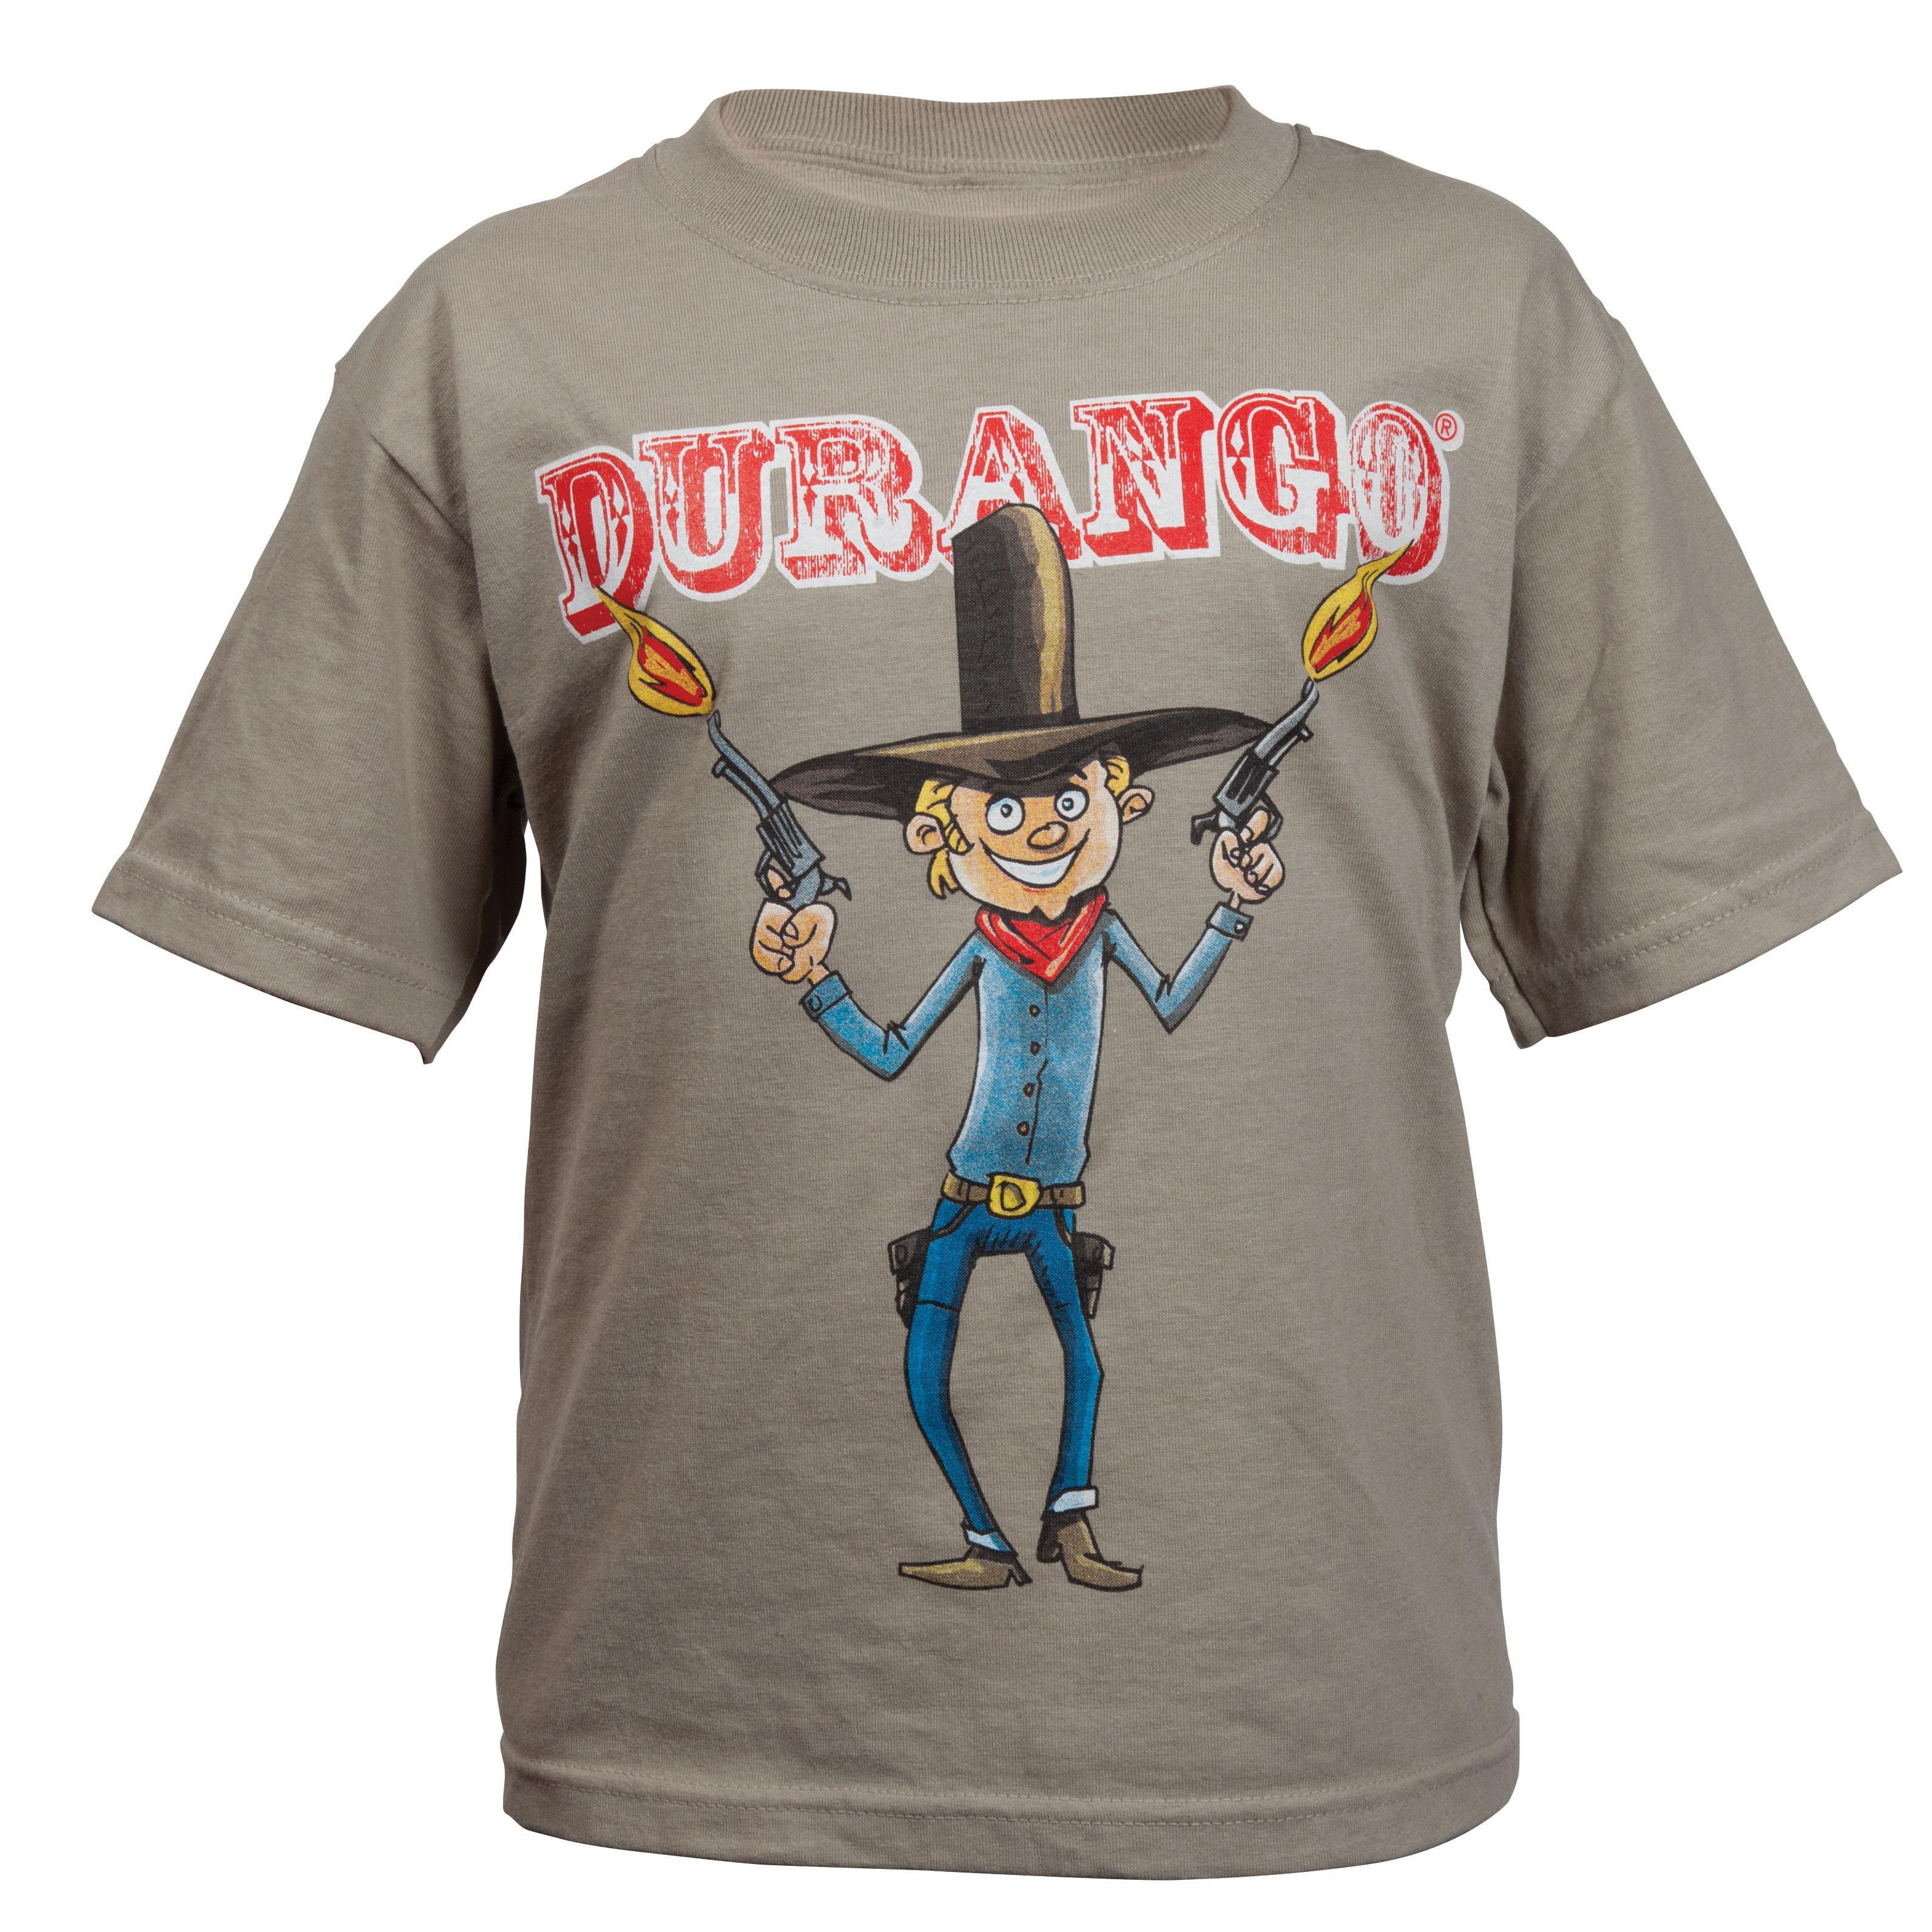 Cowboys Shirts For Men